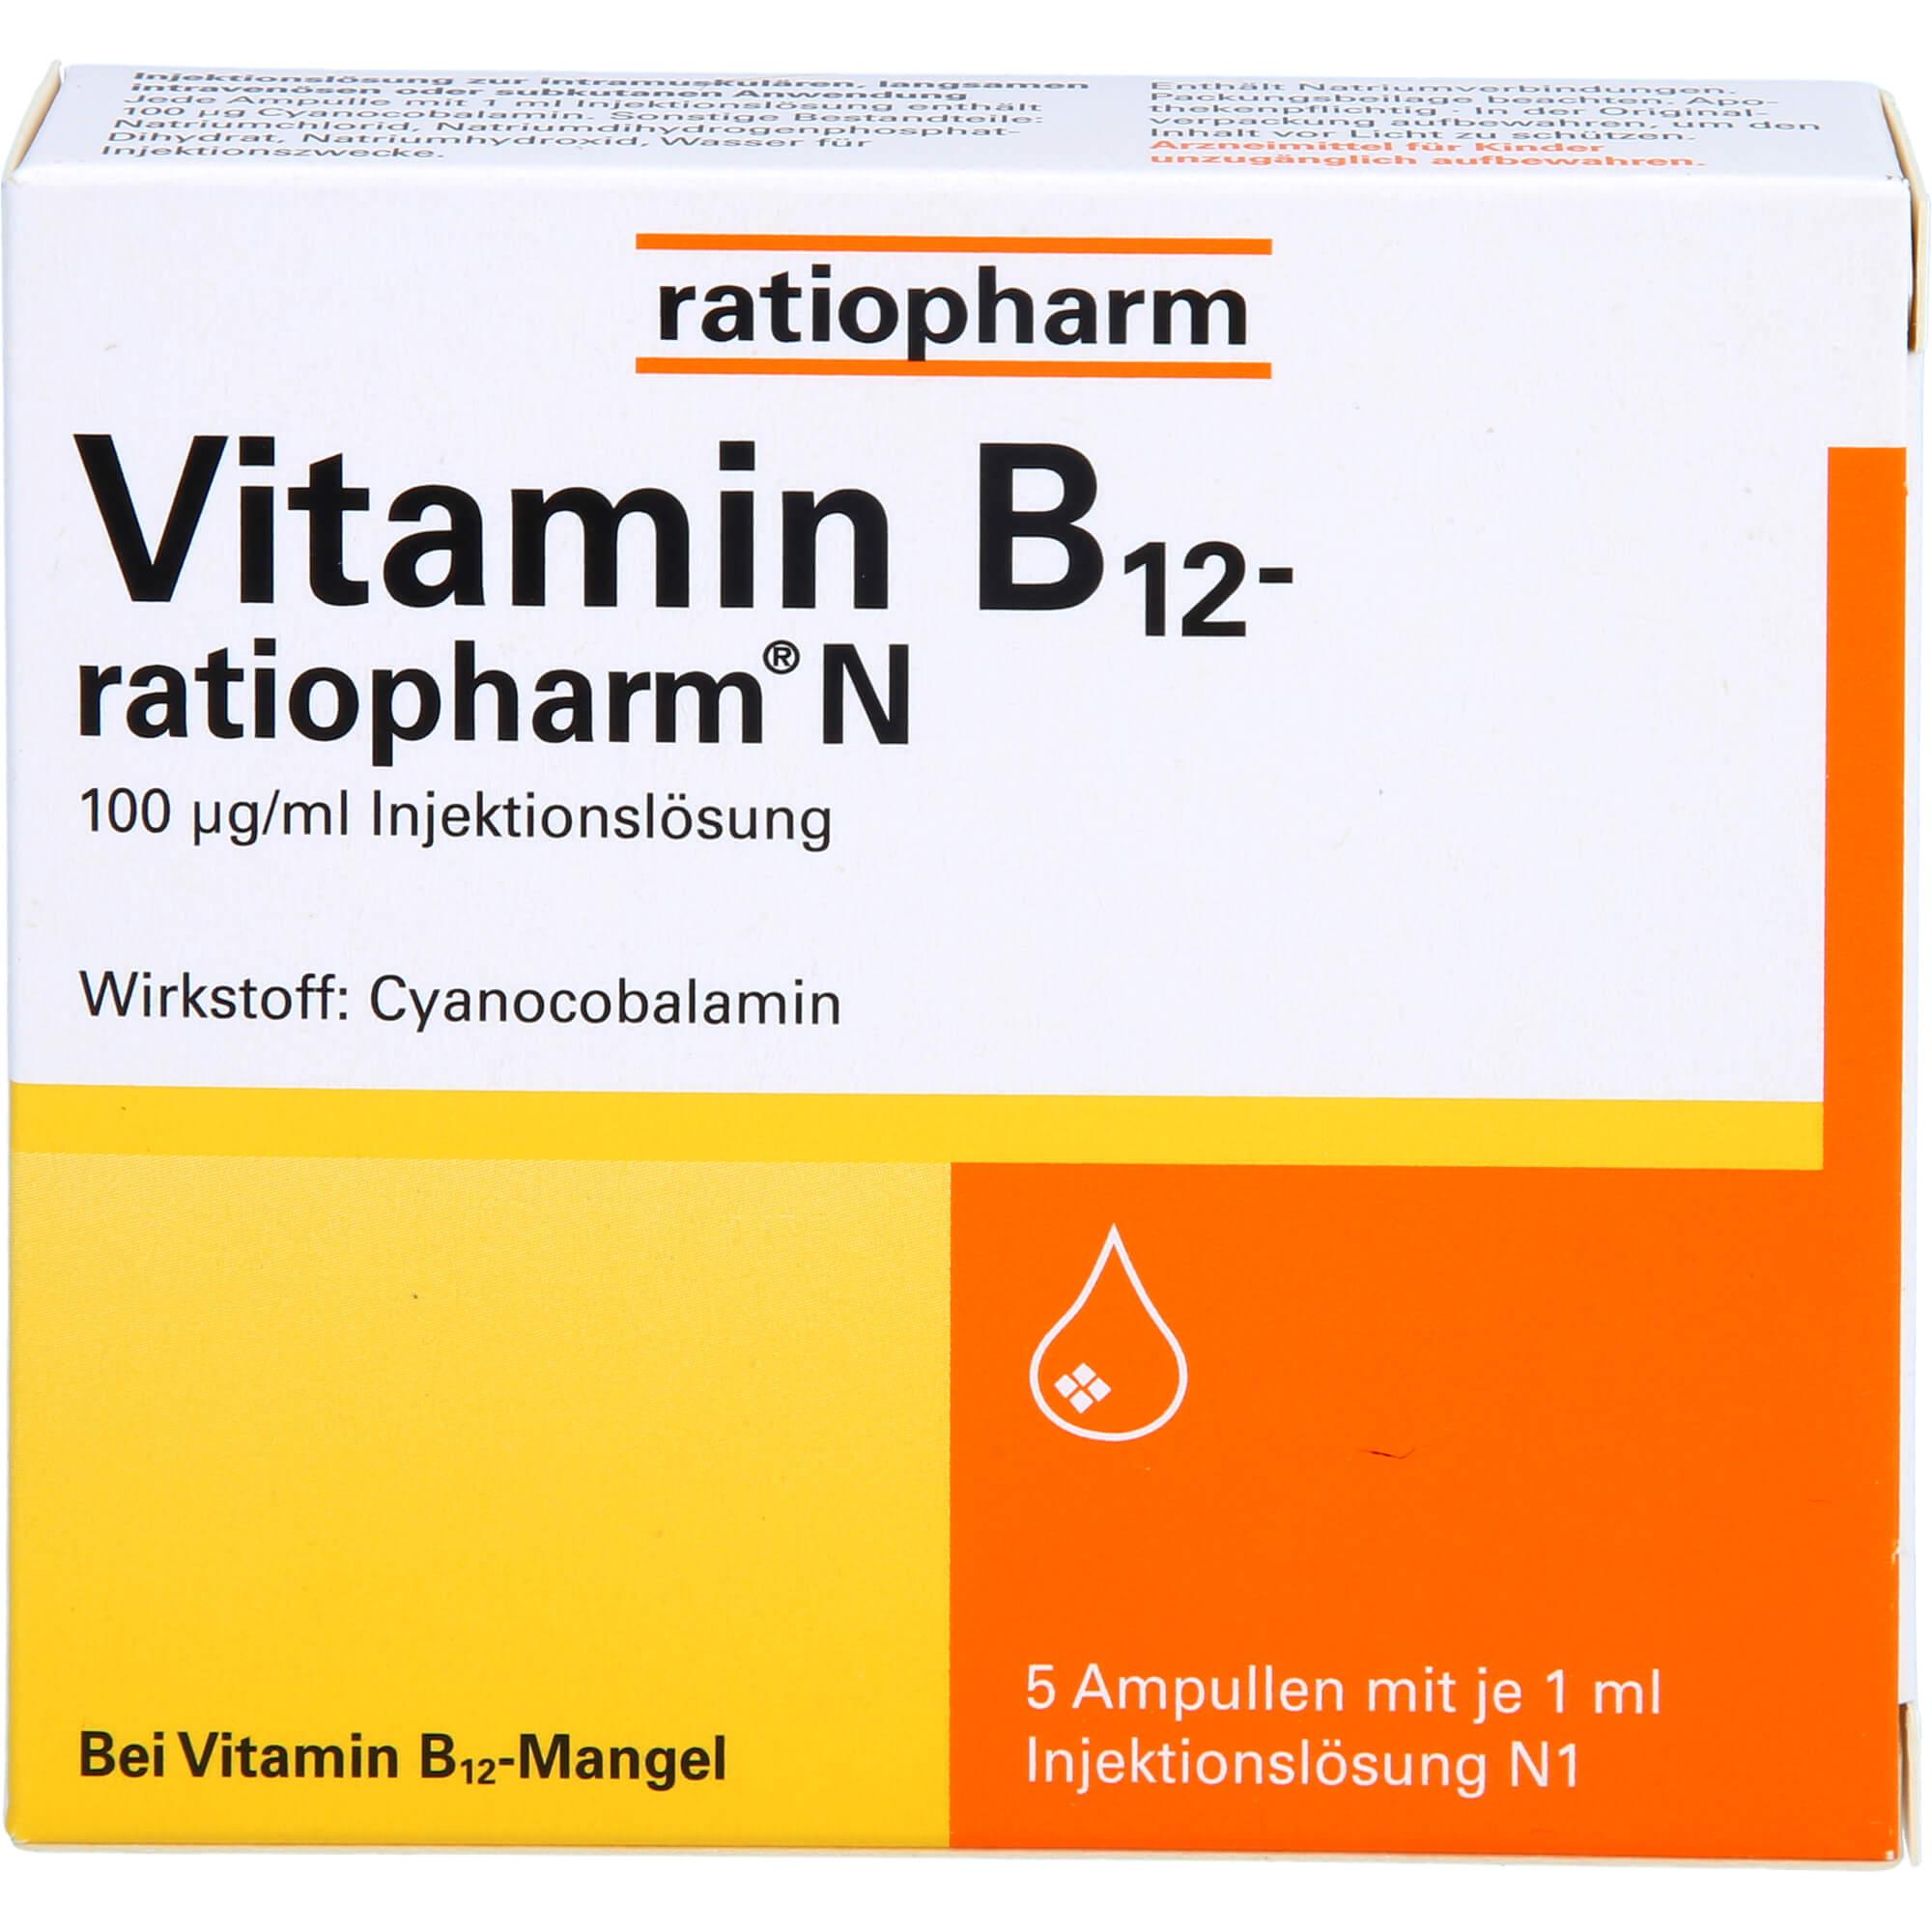 VITAMIN-B12-RATIOPHARM-N-Ampullen